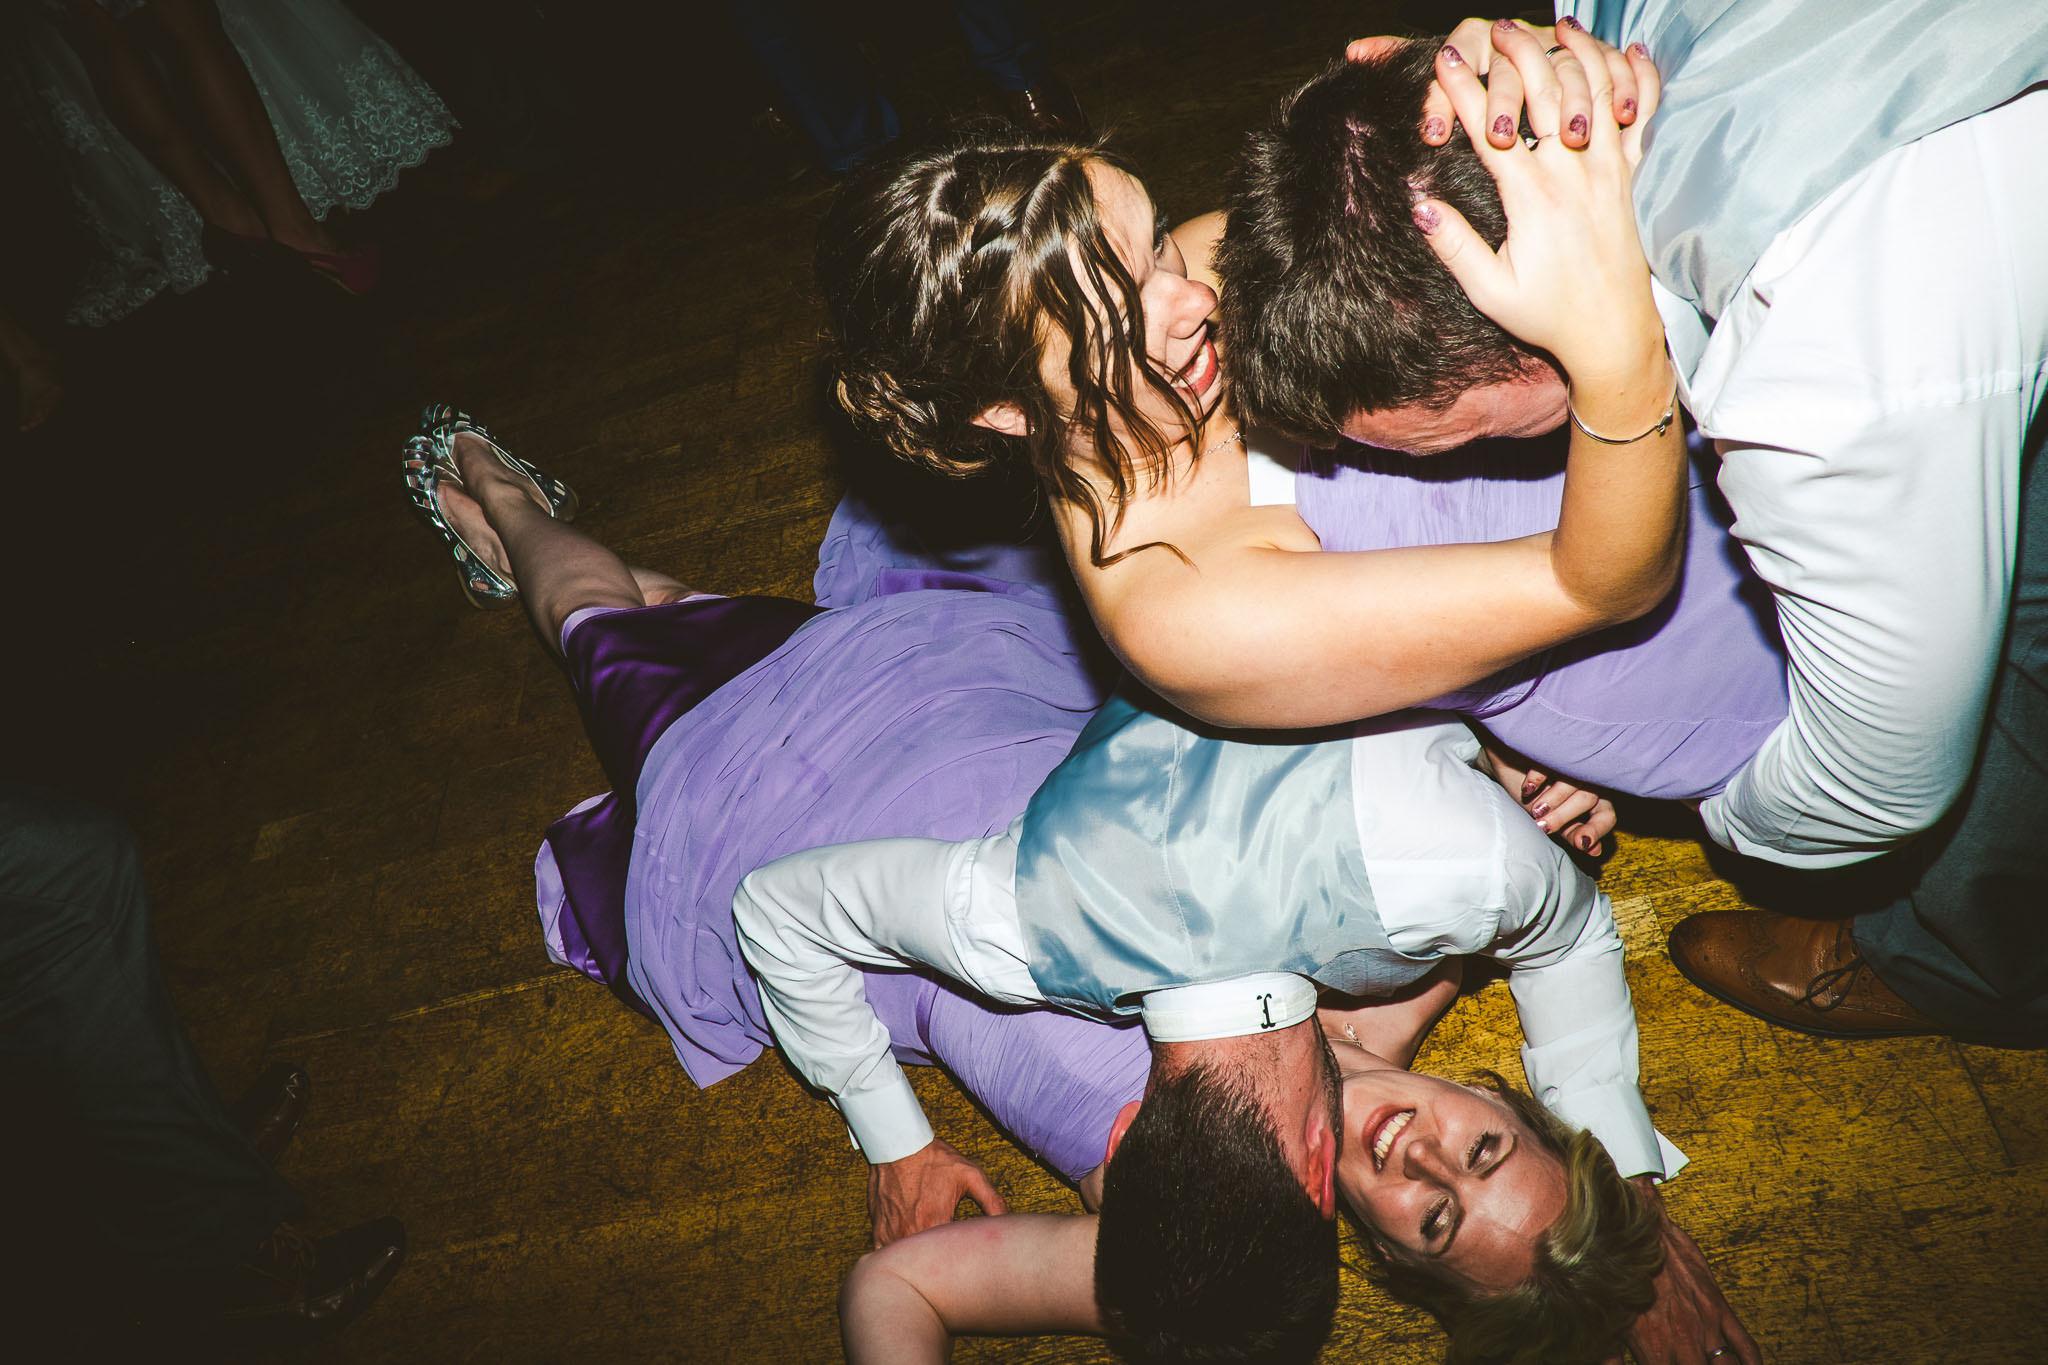 Wedding dance floor shenanigans